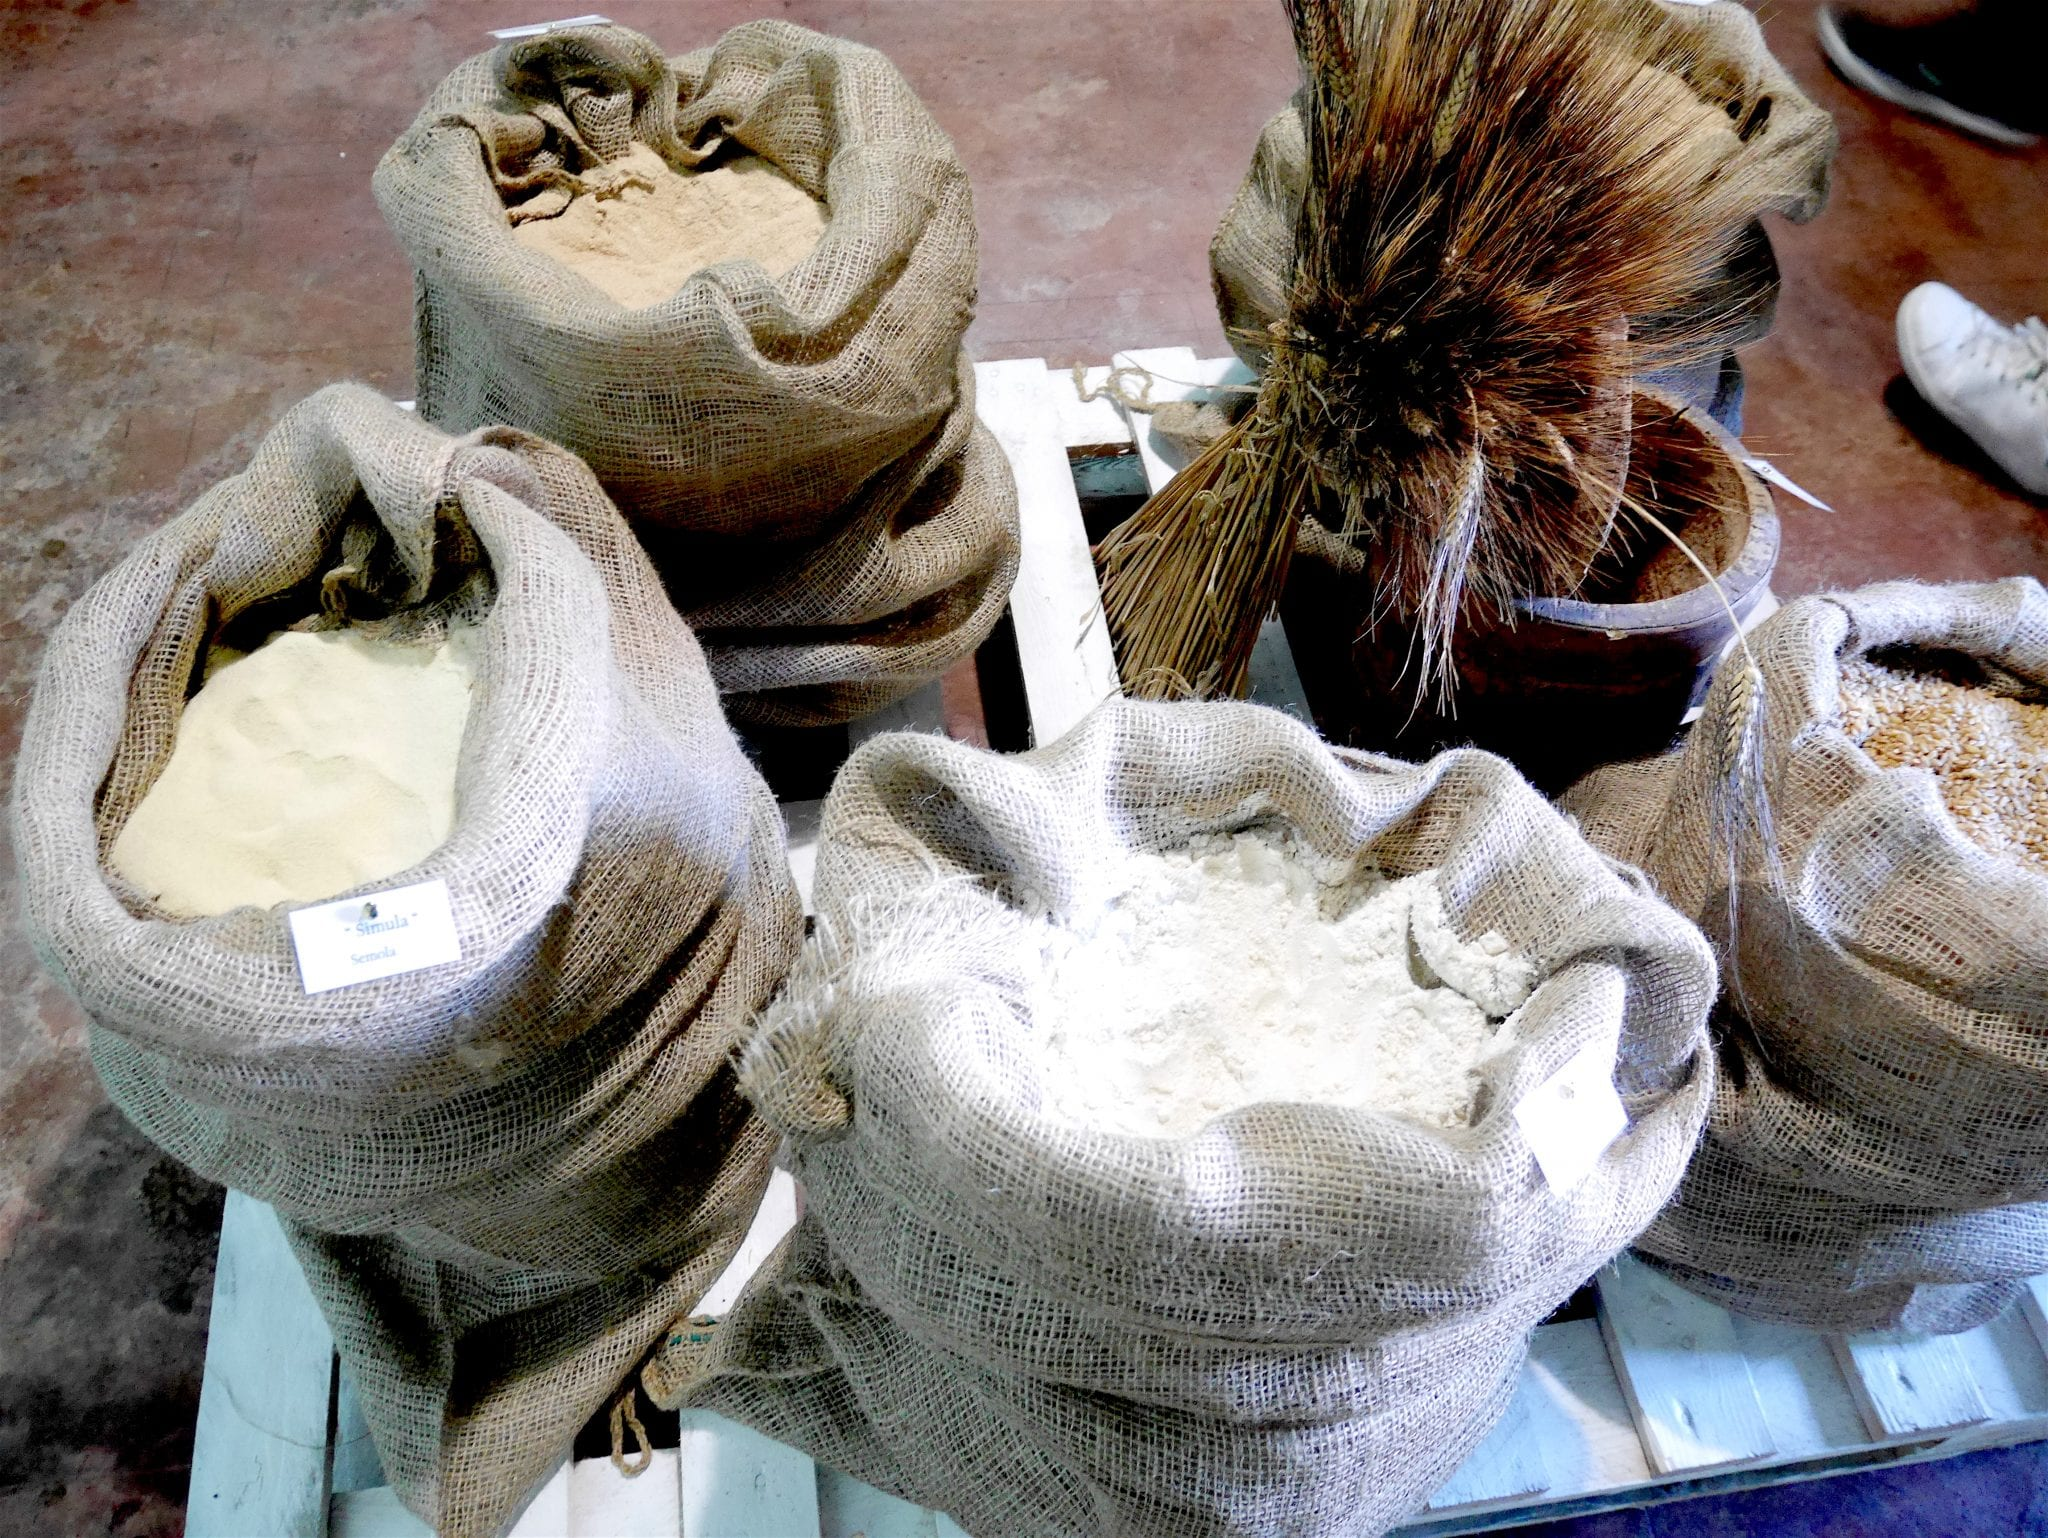 museo del pane carasau - orgosolo - le plume